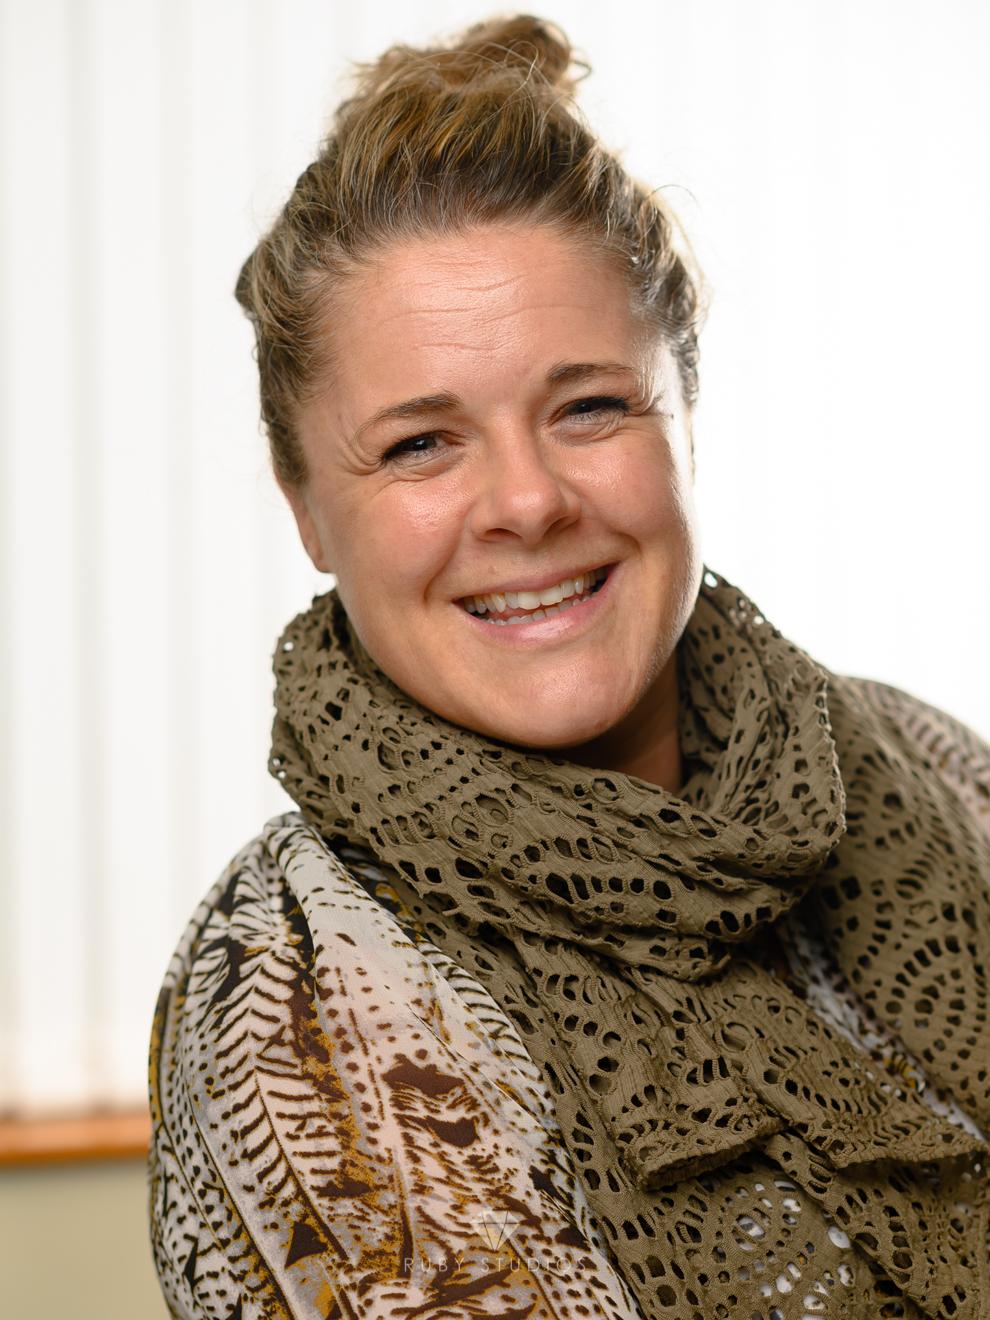 Rotarian Clare Turner-Marshall